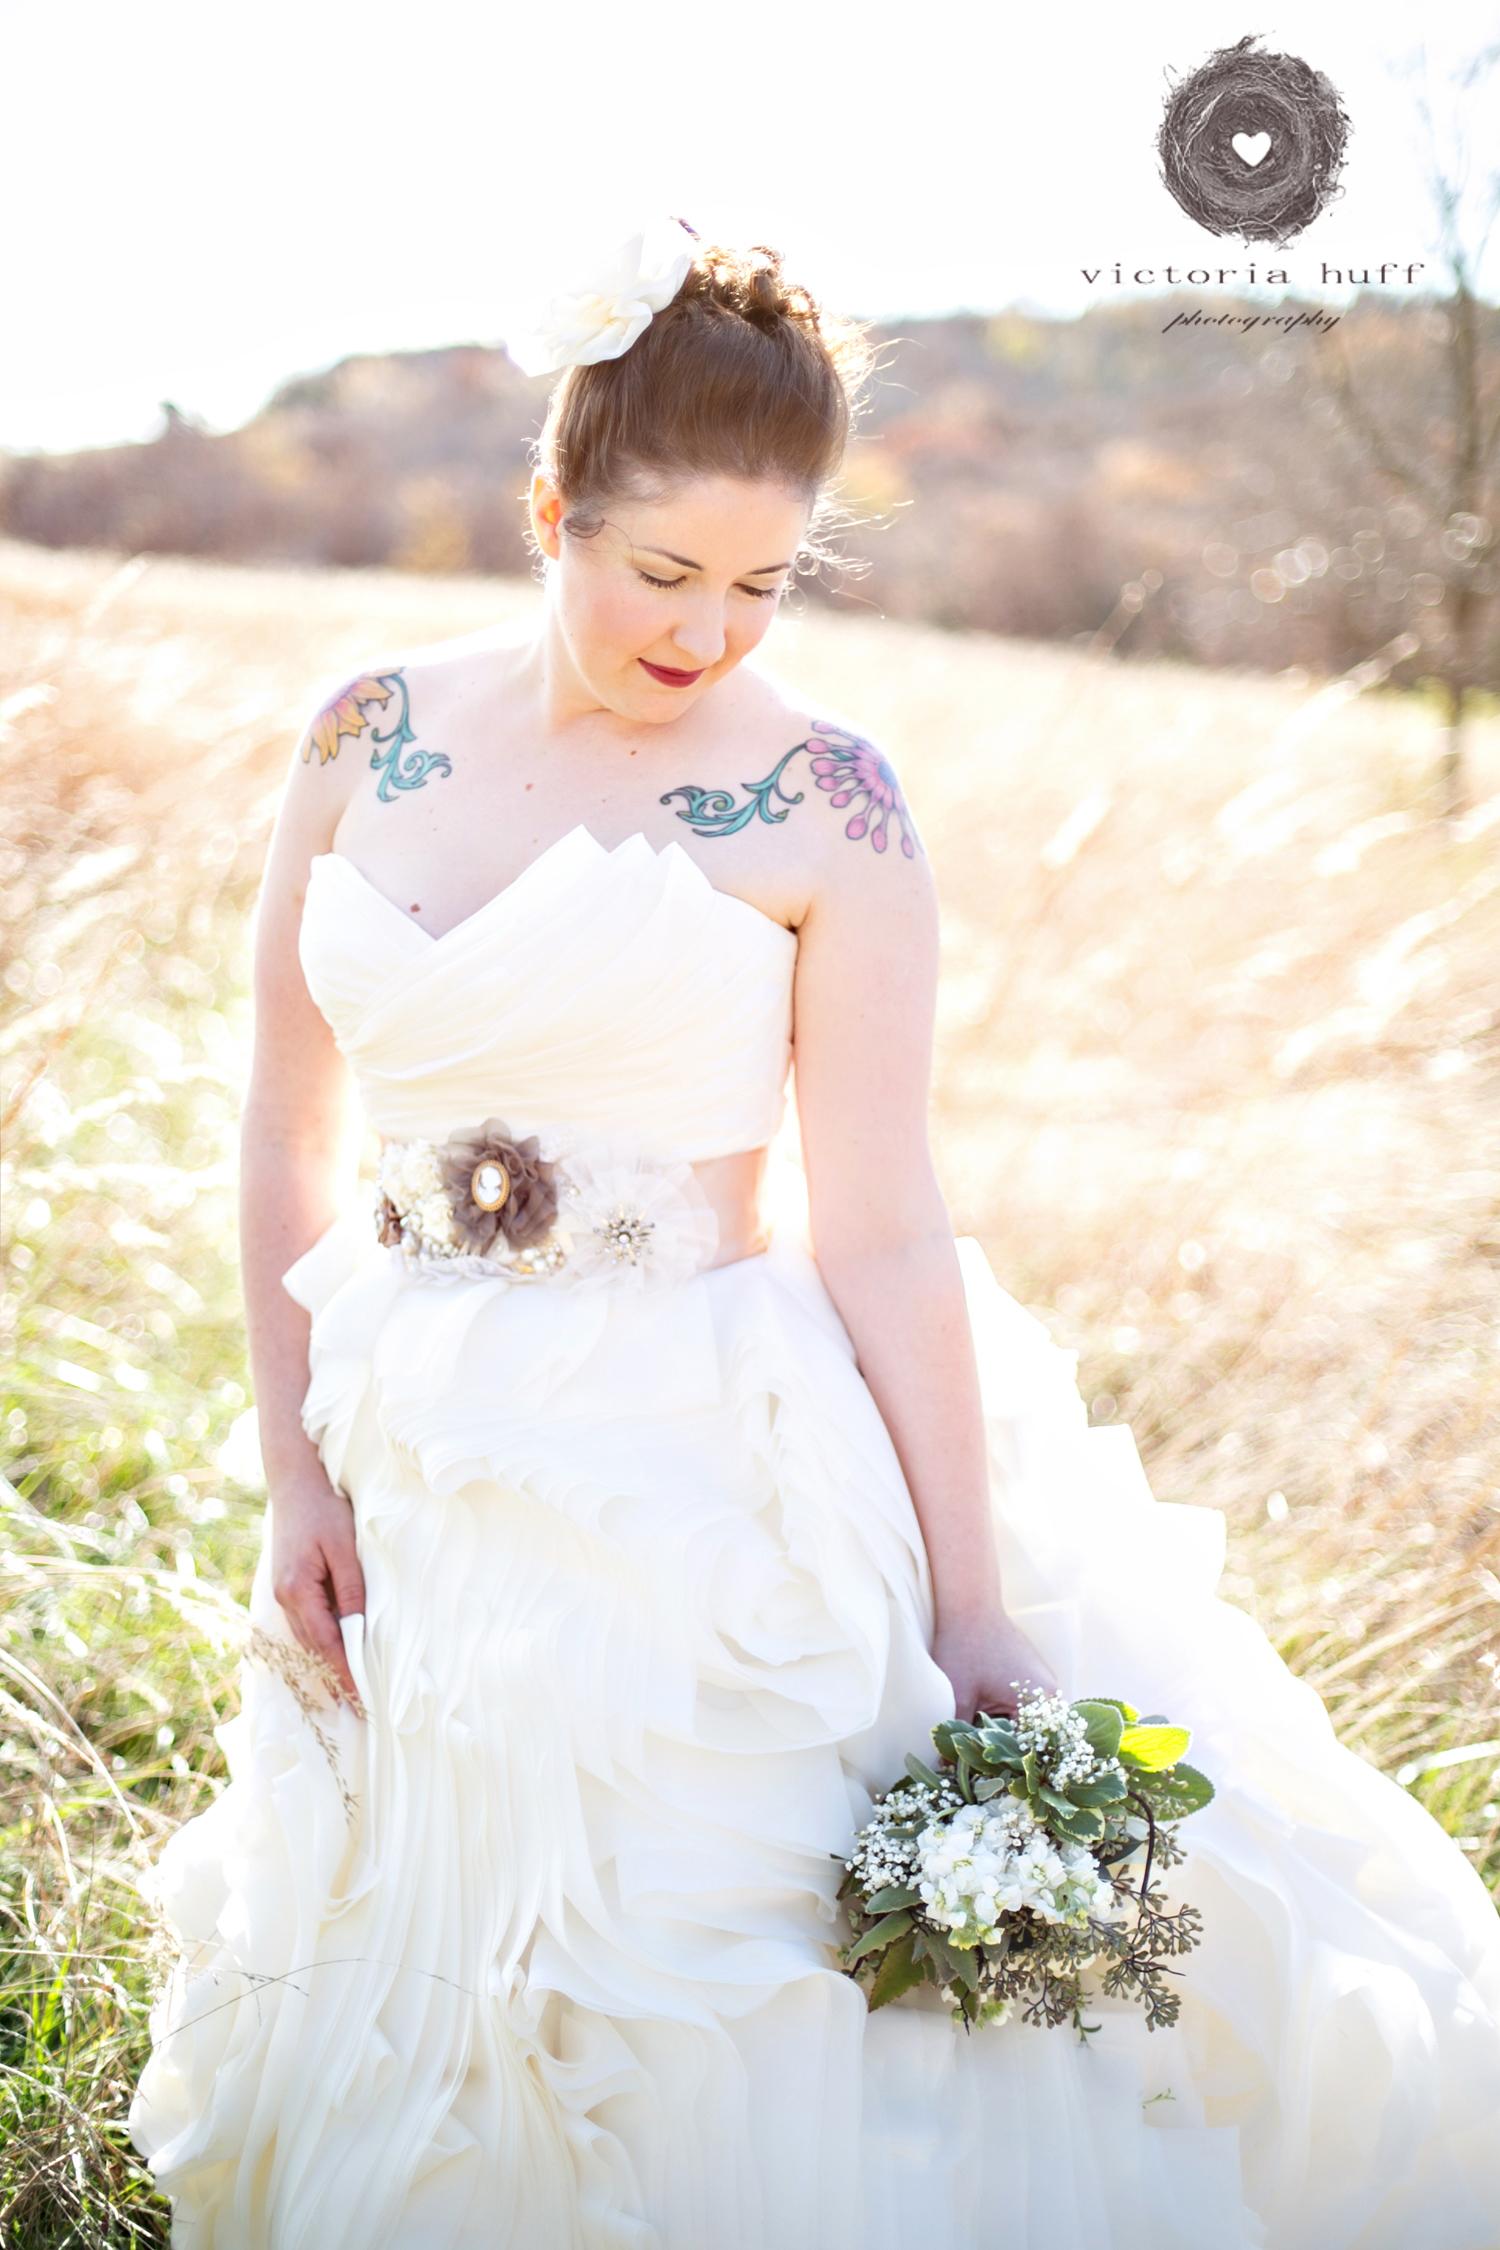 Wedding-Photography-Morgan-Rockhold-Jordan-Earle-Topeka-Kansas-Great-Overland-Train-Station-Vintage-3.jpg